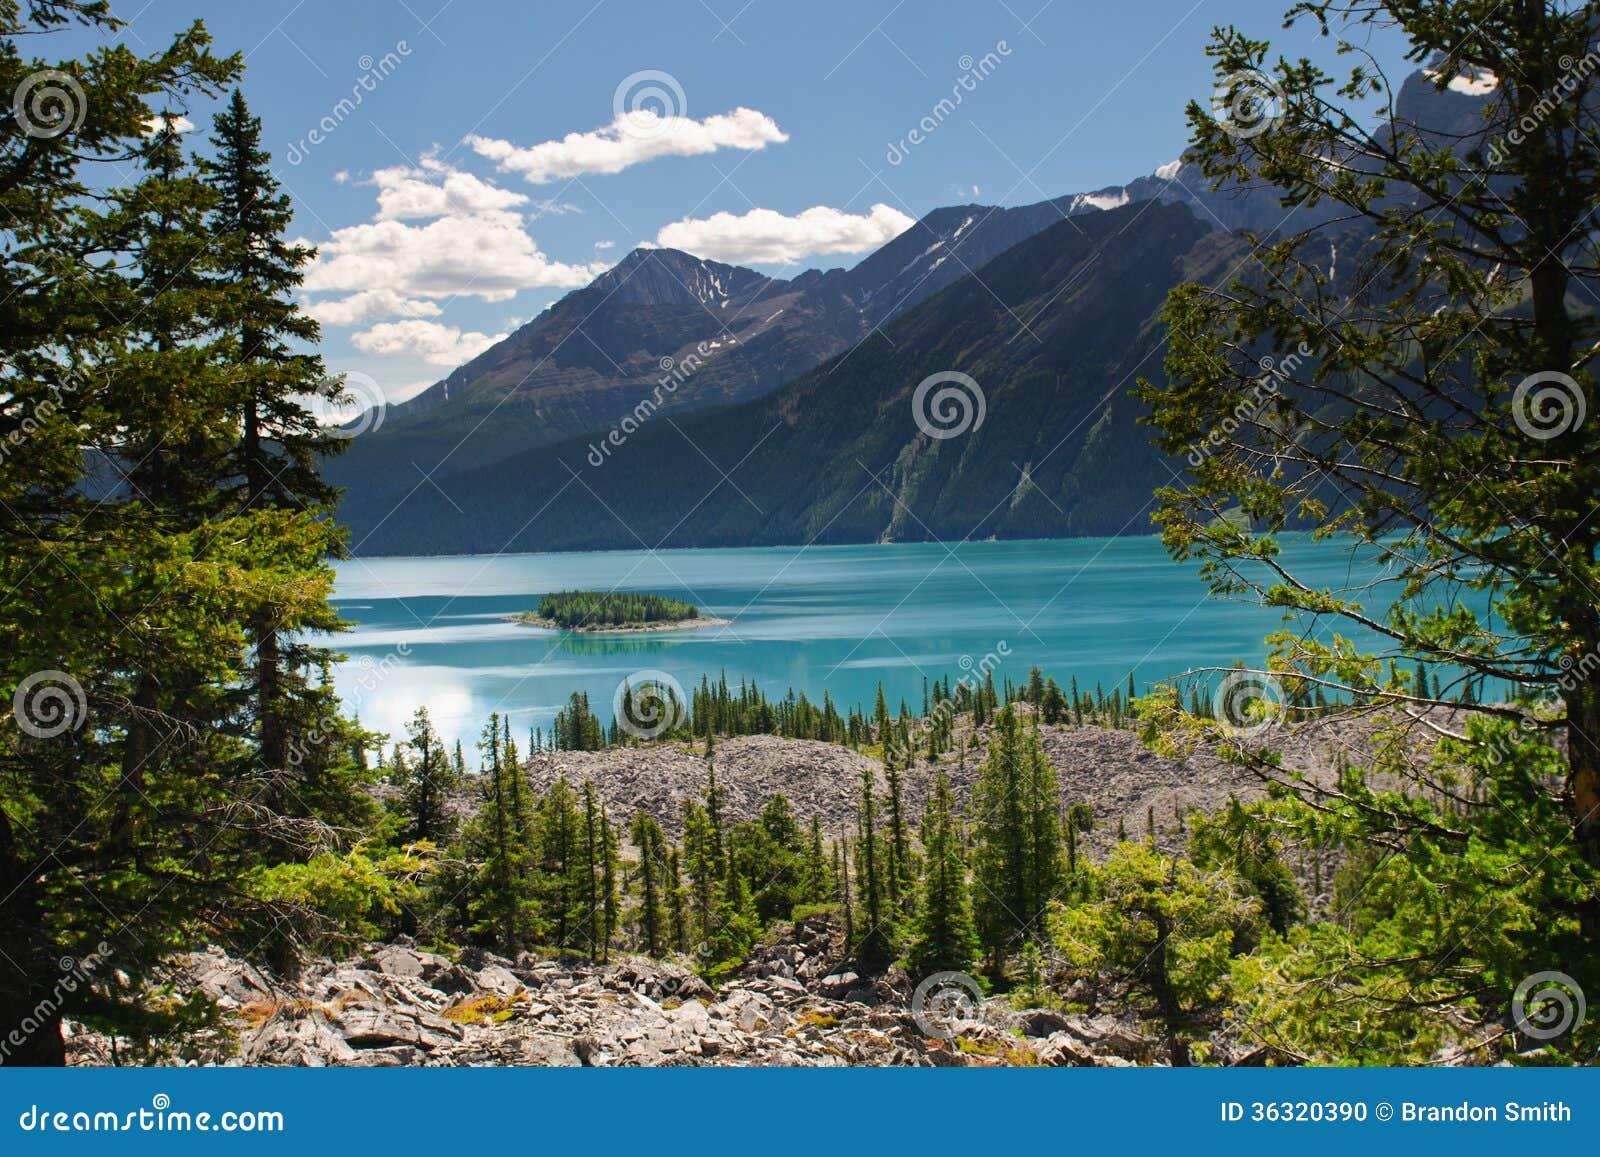 Scenic Mountain Views Kananaskis Country Alberta Canada Stock Photo ...